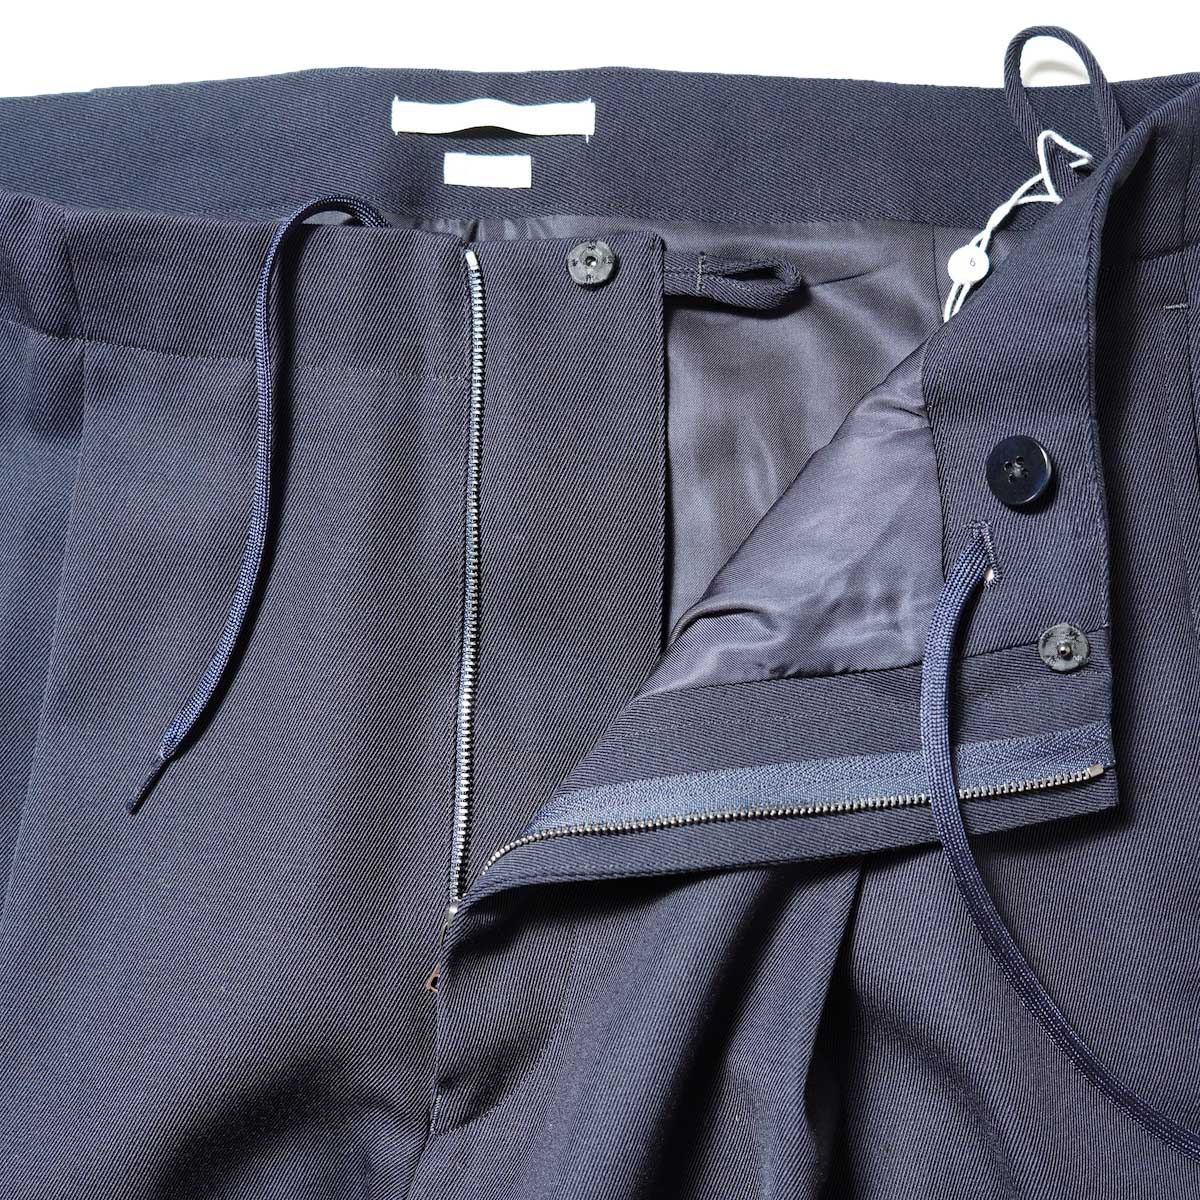 Blurhms / Wool Surge Super Wide Easy Slacks (Dark Navy)ジップ